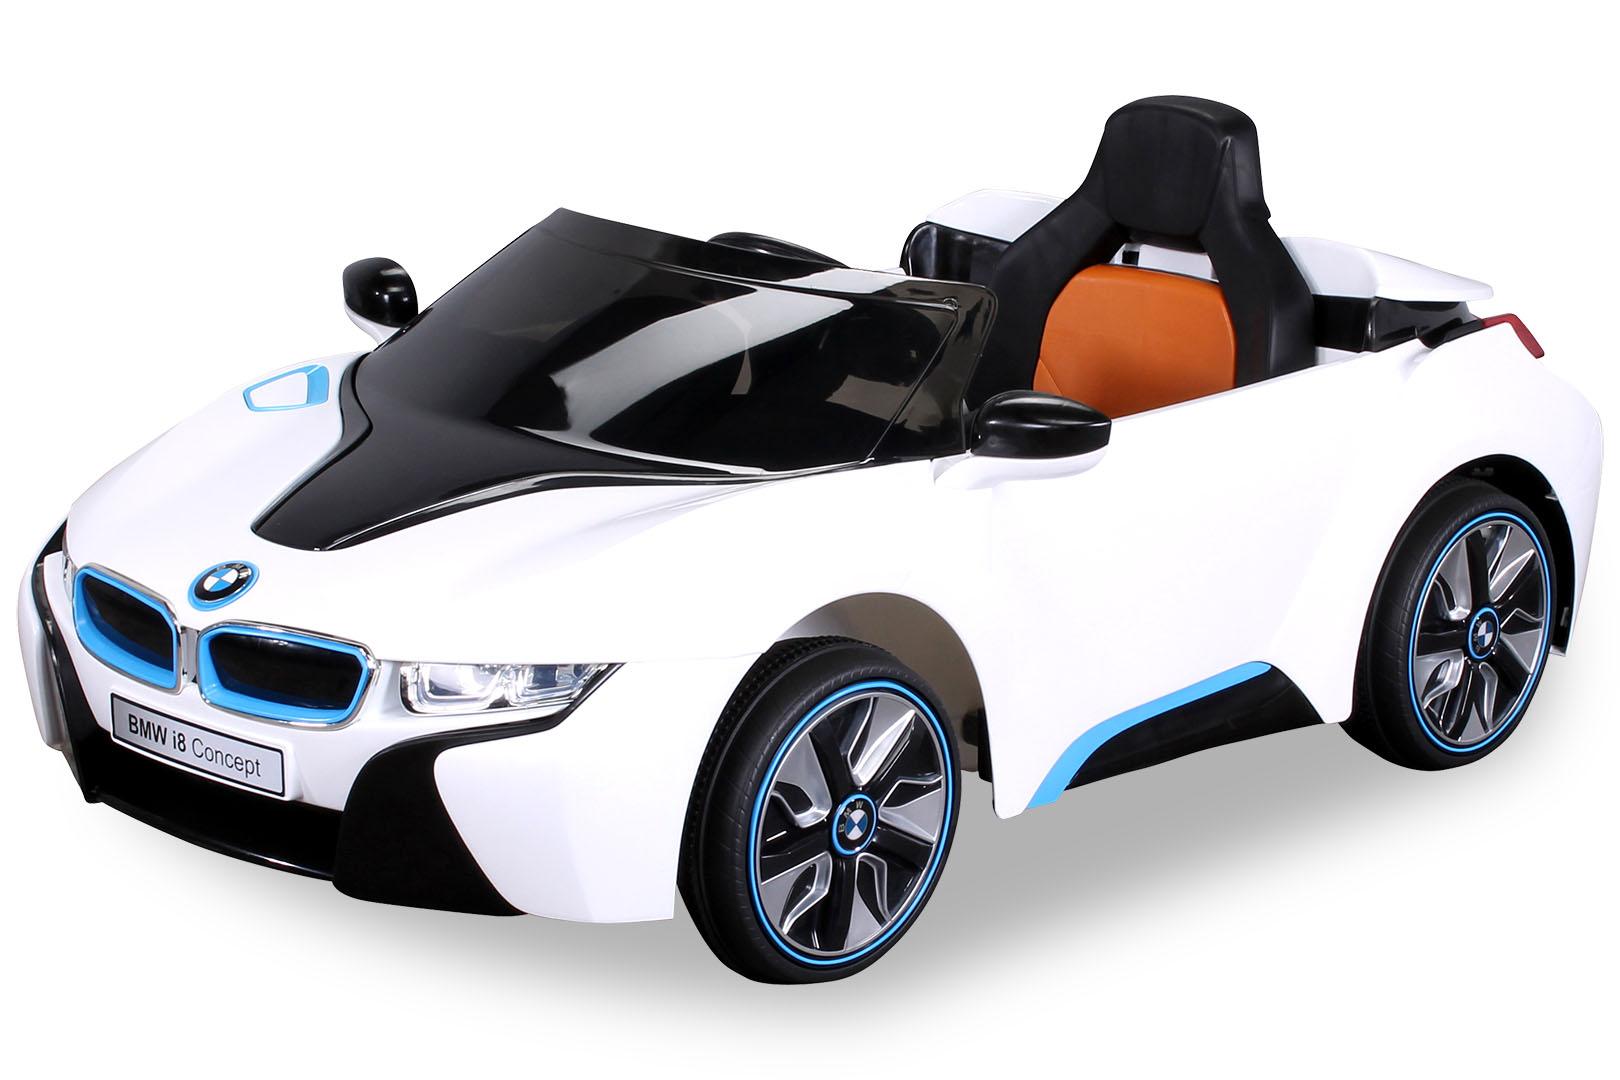 kinder elektro auto bmw i8 kinderauto elektrofahrzeug kinderfahrzeug spielzeug ebay. Black Bedroom Furniture Sets. Home Design Ideas